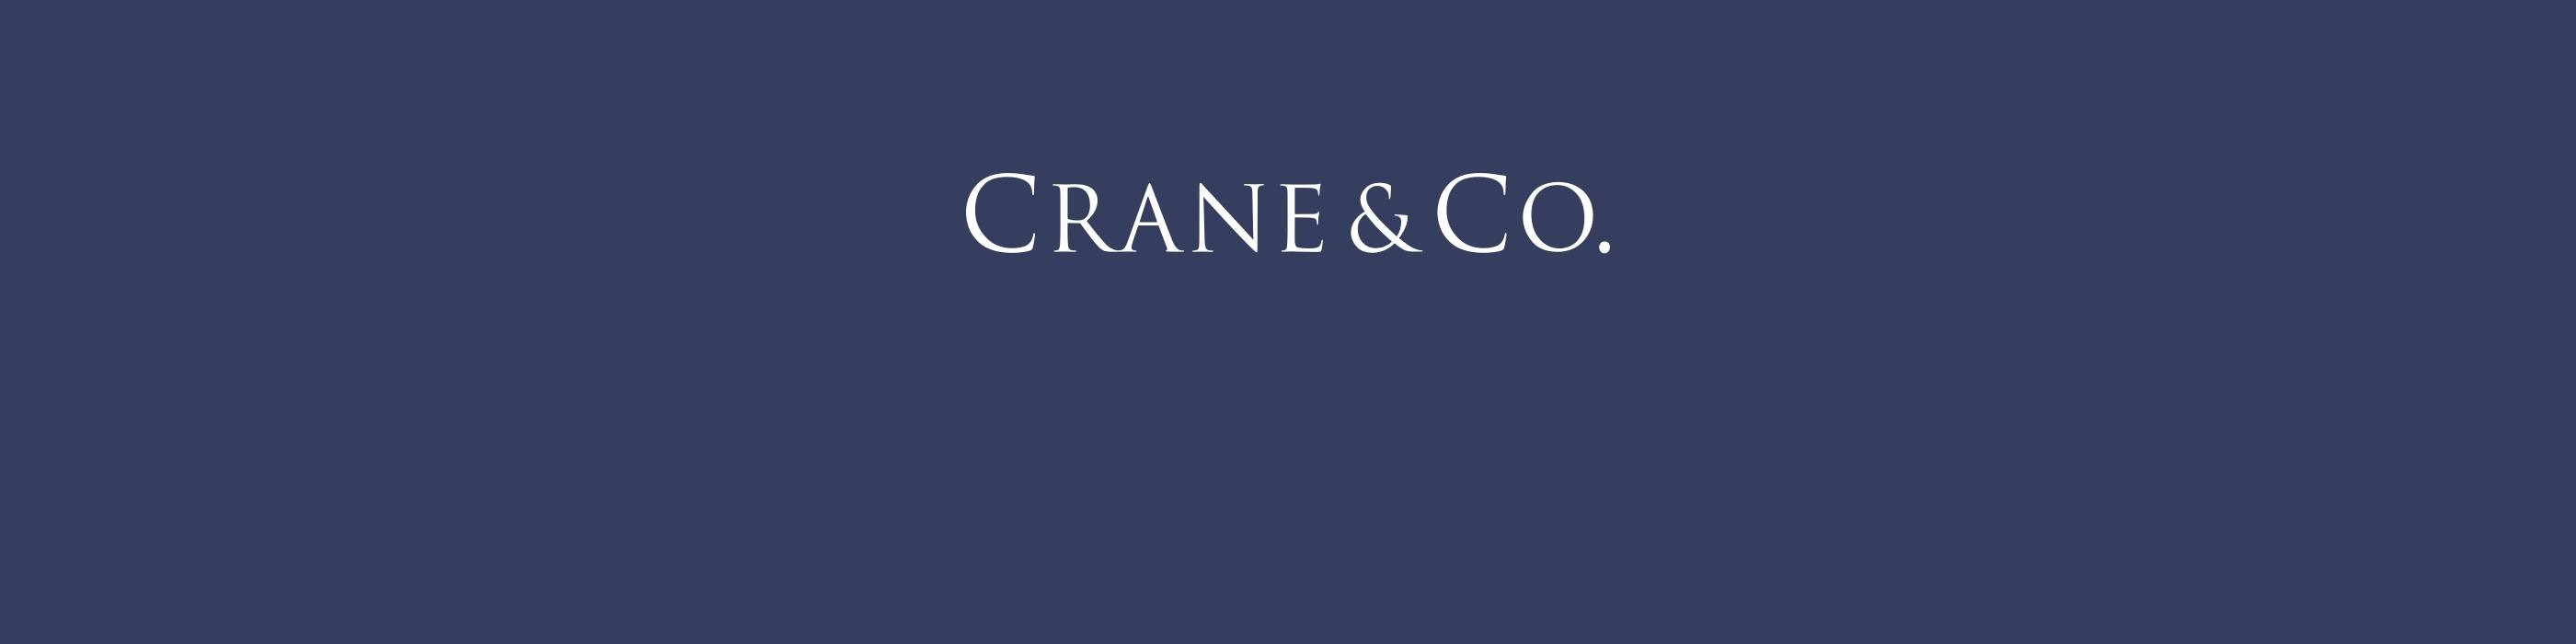 Crane & Co. - Online